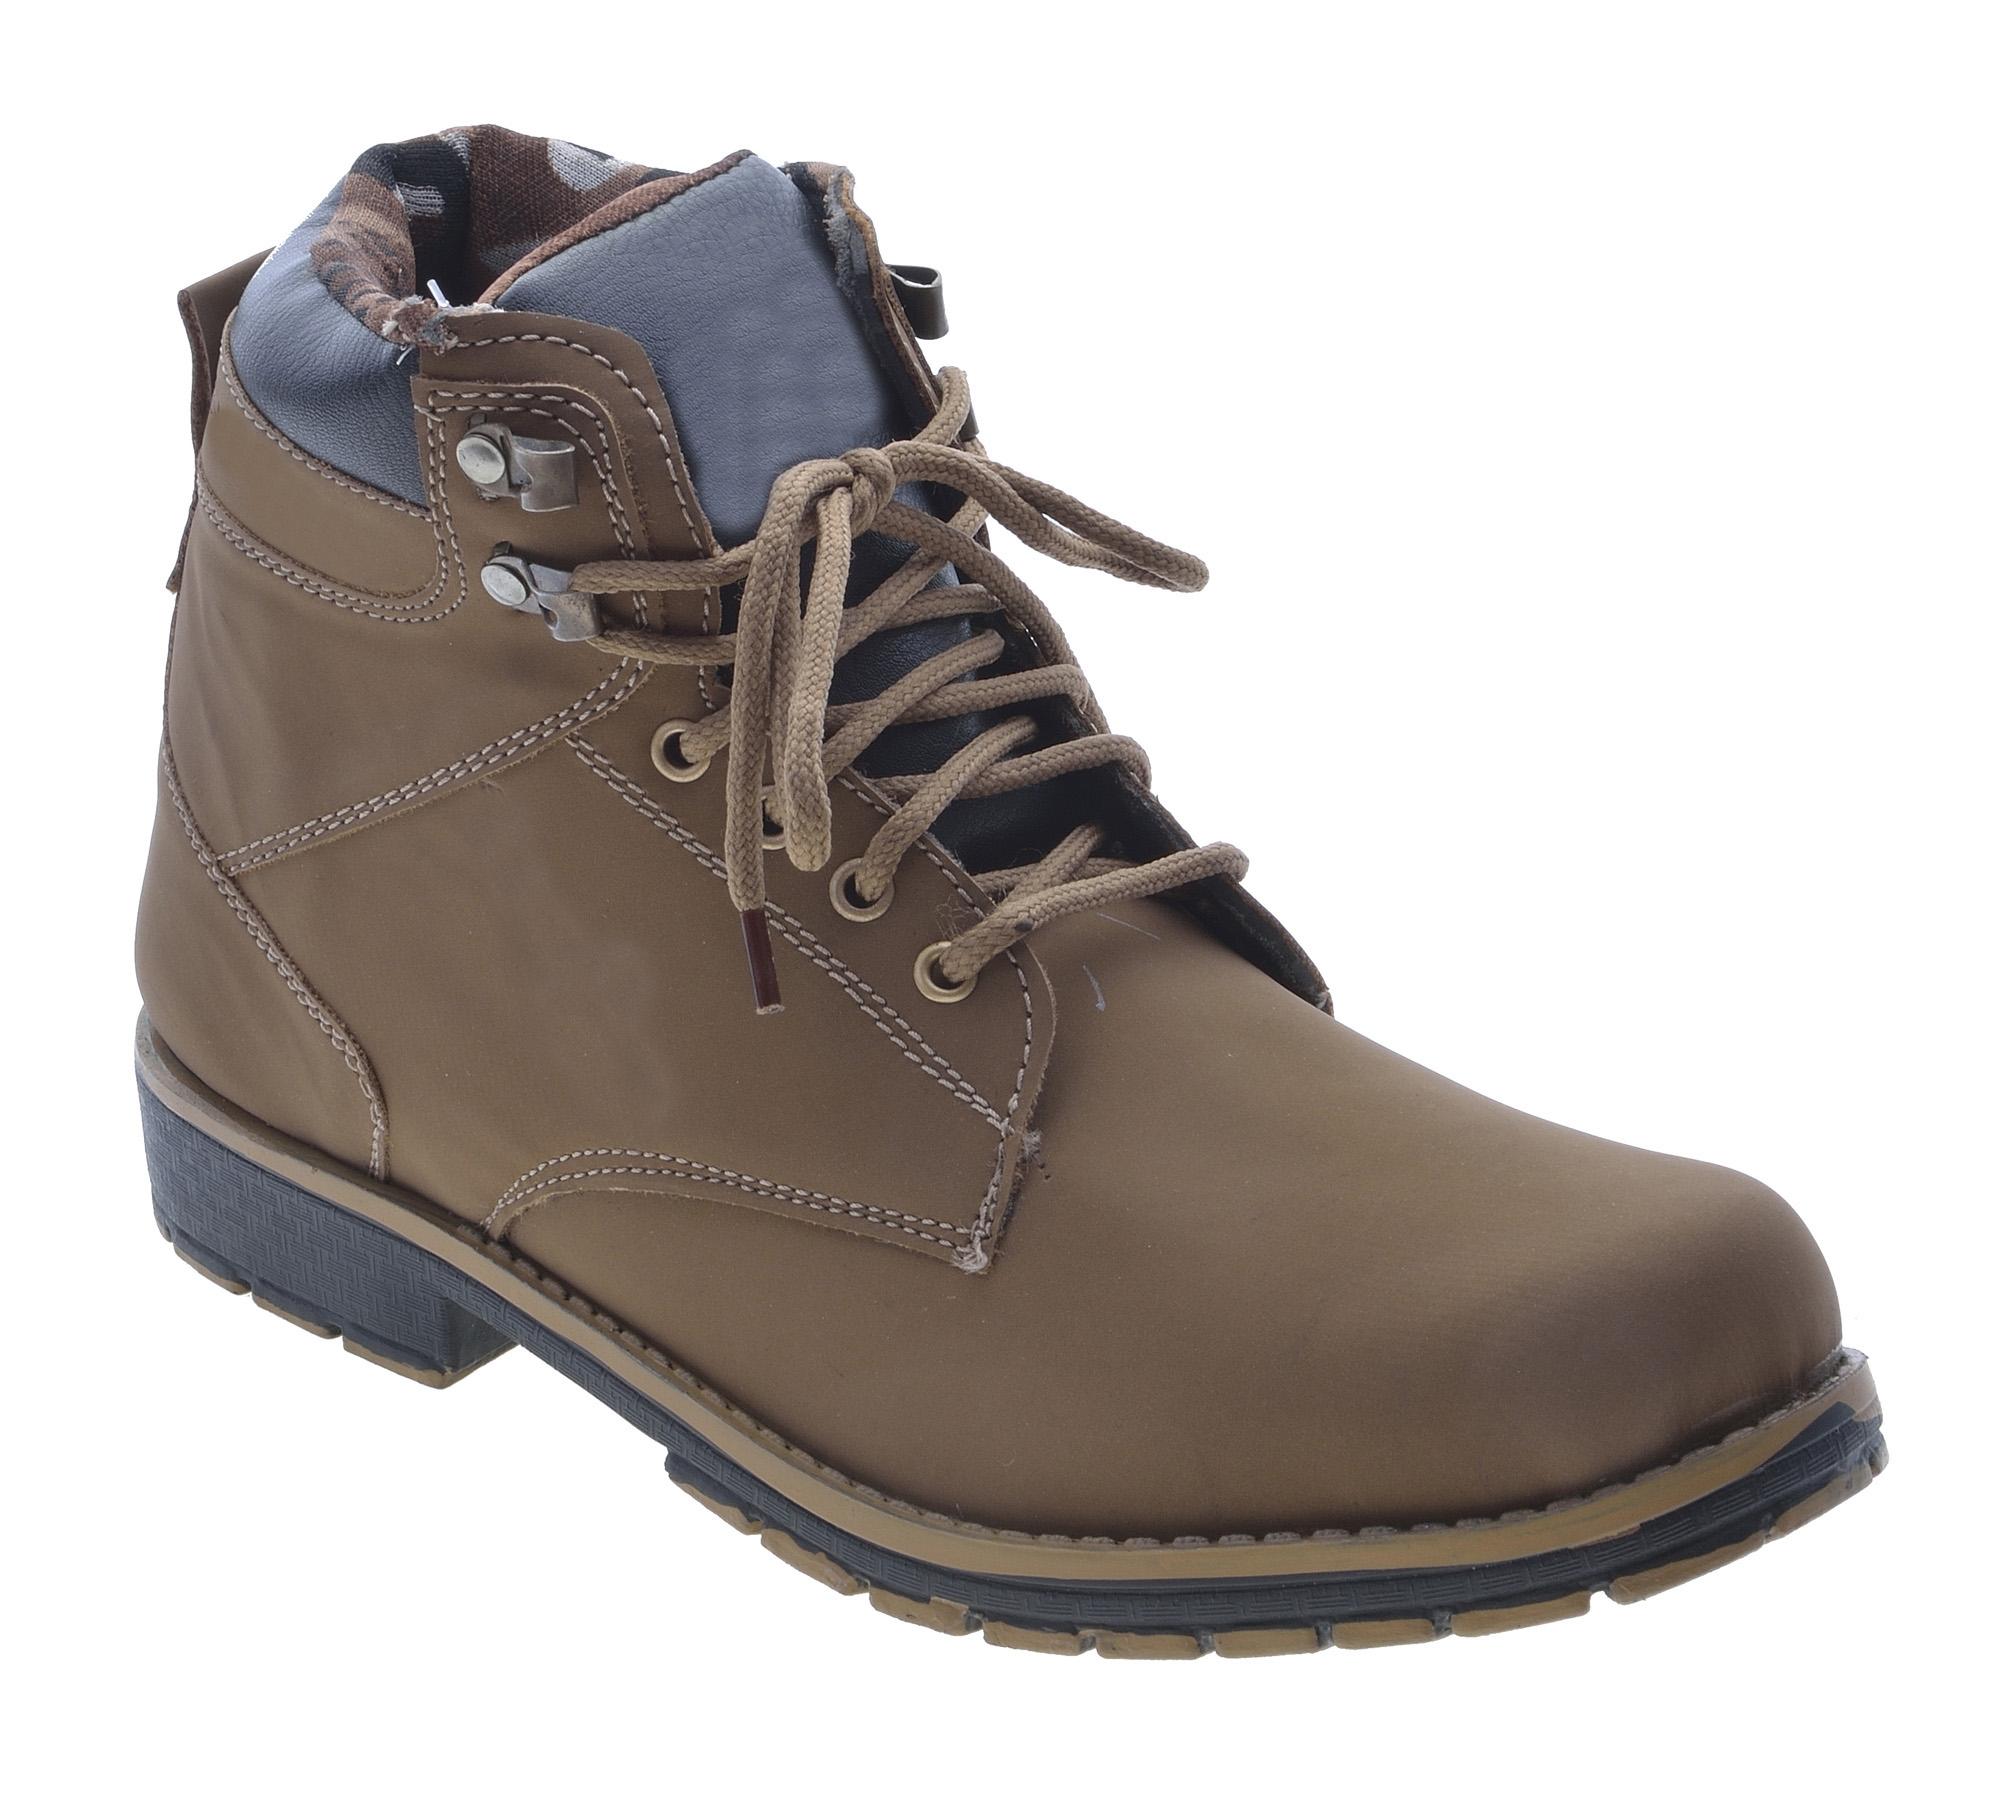 Boysons brown stylish ankle length boots(opera53-drkbrwn)